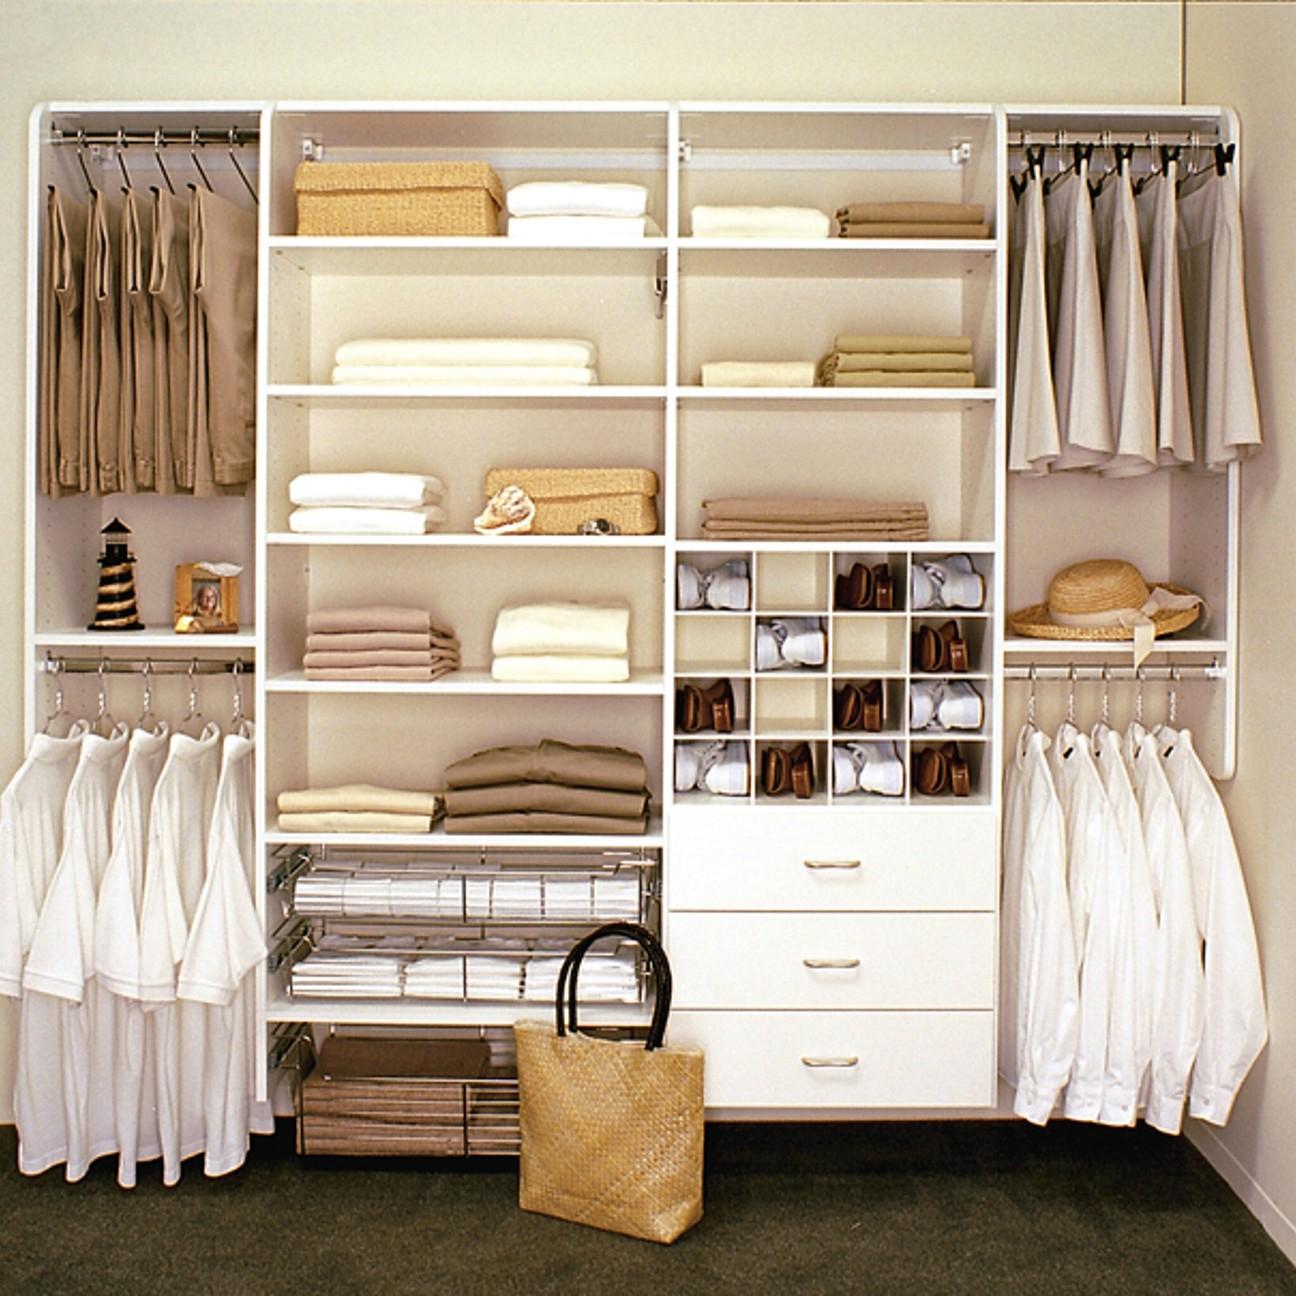 walk-in-linen-closet-design-photo-14